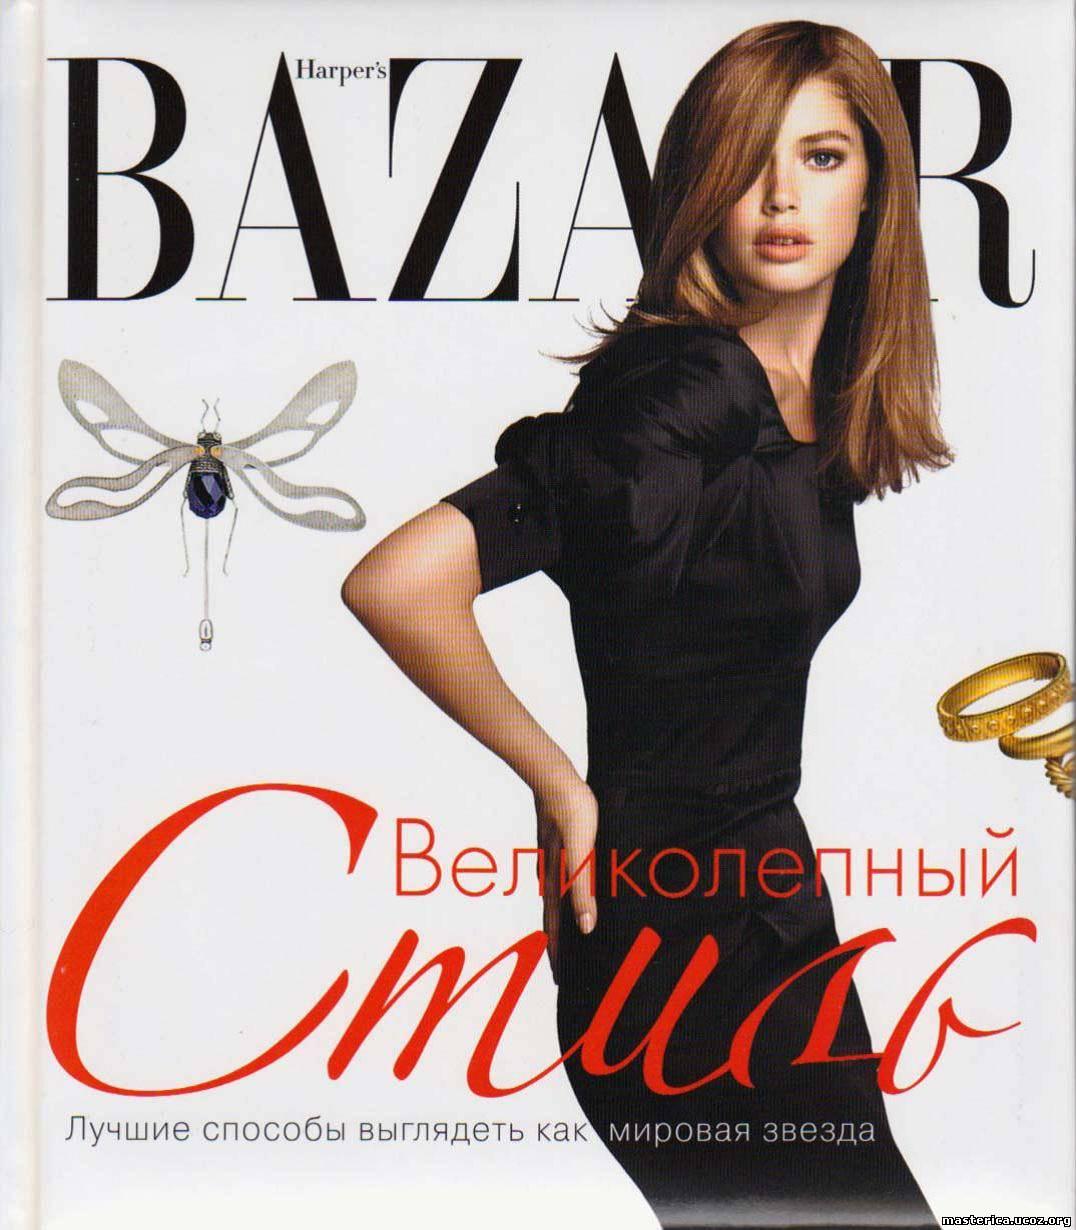 Harper´s Bazaar. Великолепный стиль 2008